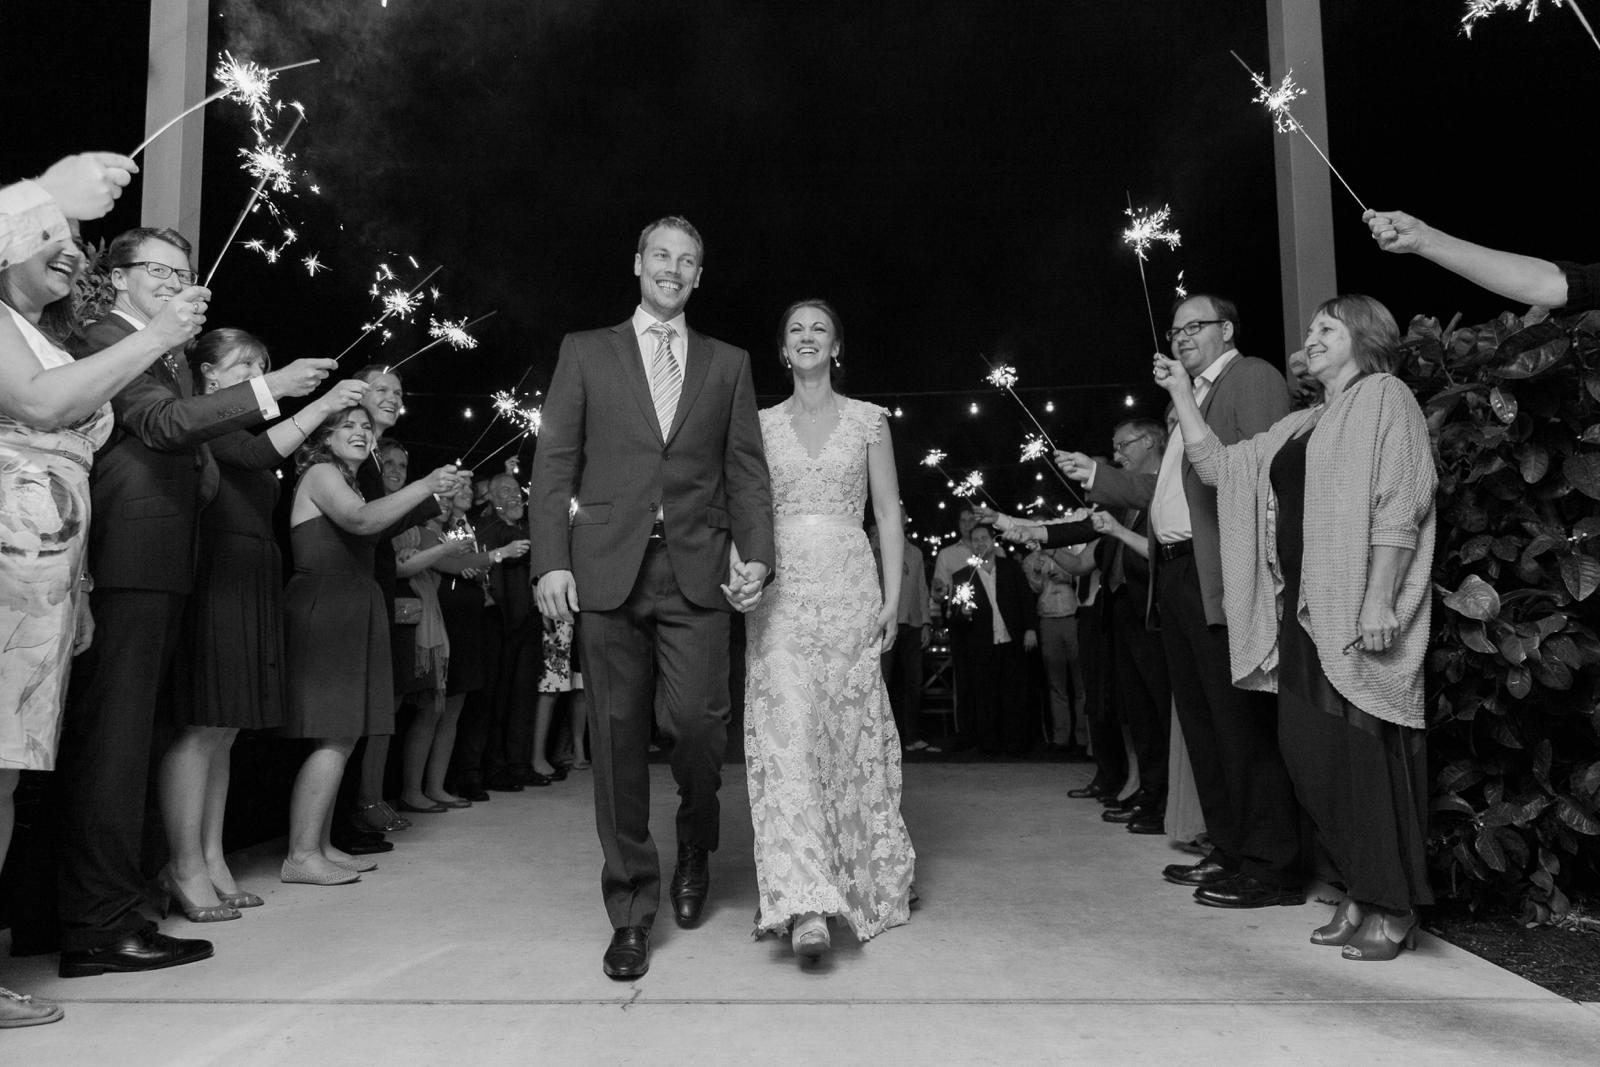 Yountville Wedding Photographer Meo Baaklini-Wedding Venue Longmeadow Ranch_0018.jpg